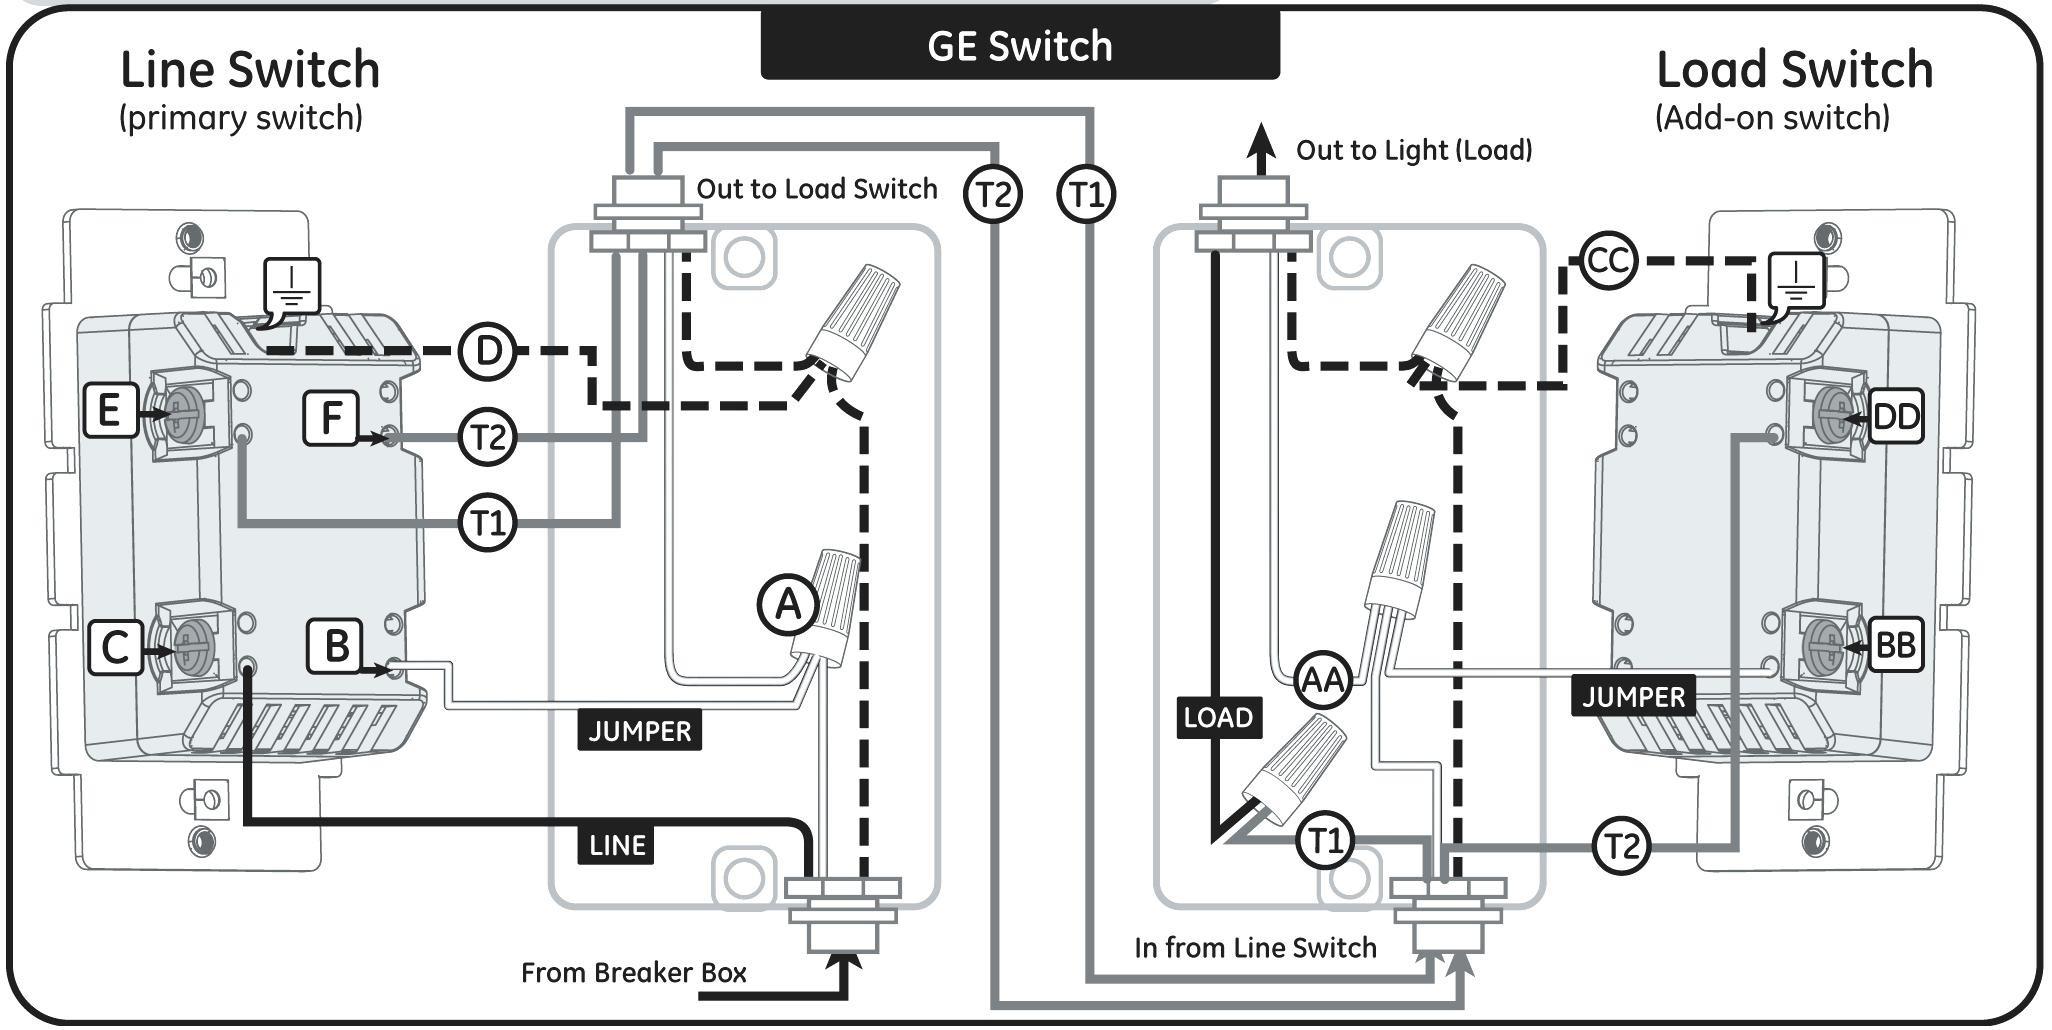 Leviton 3 Way Dimmer Wiring Diagram E Way Dimmer Switch Wiring